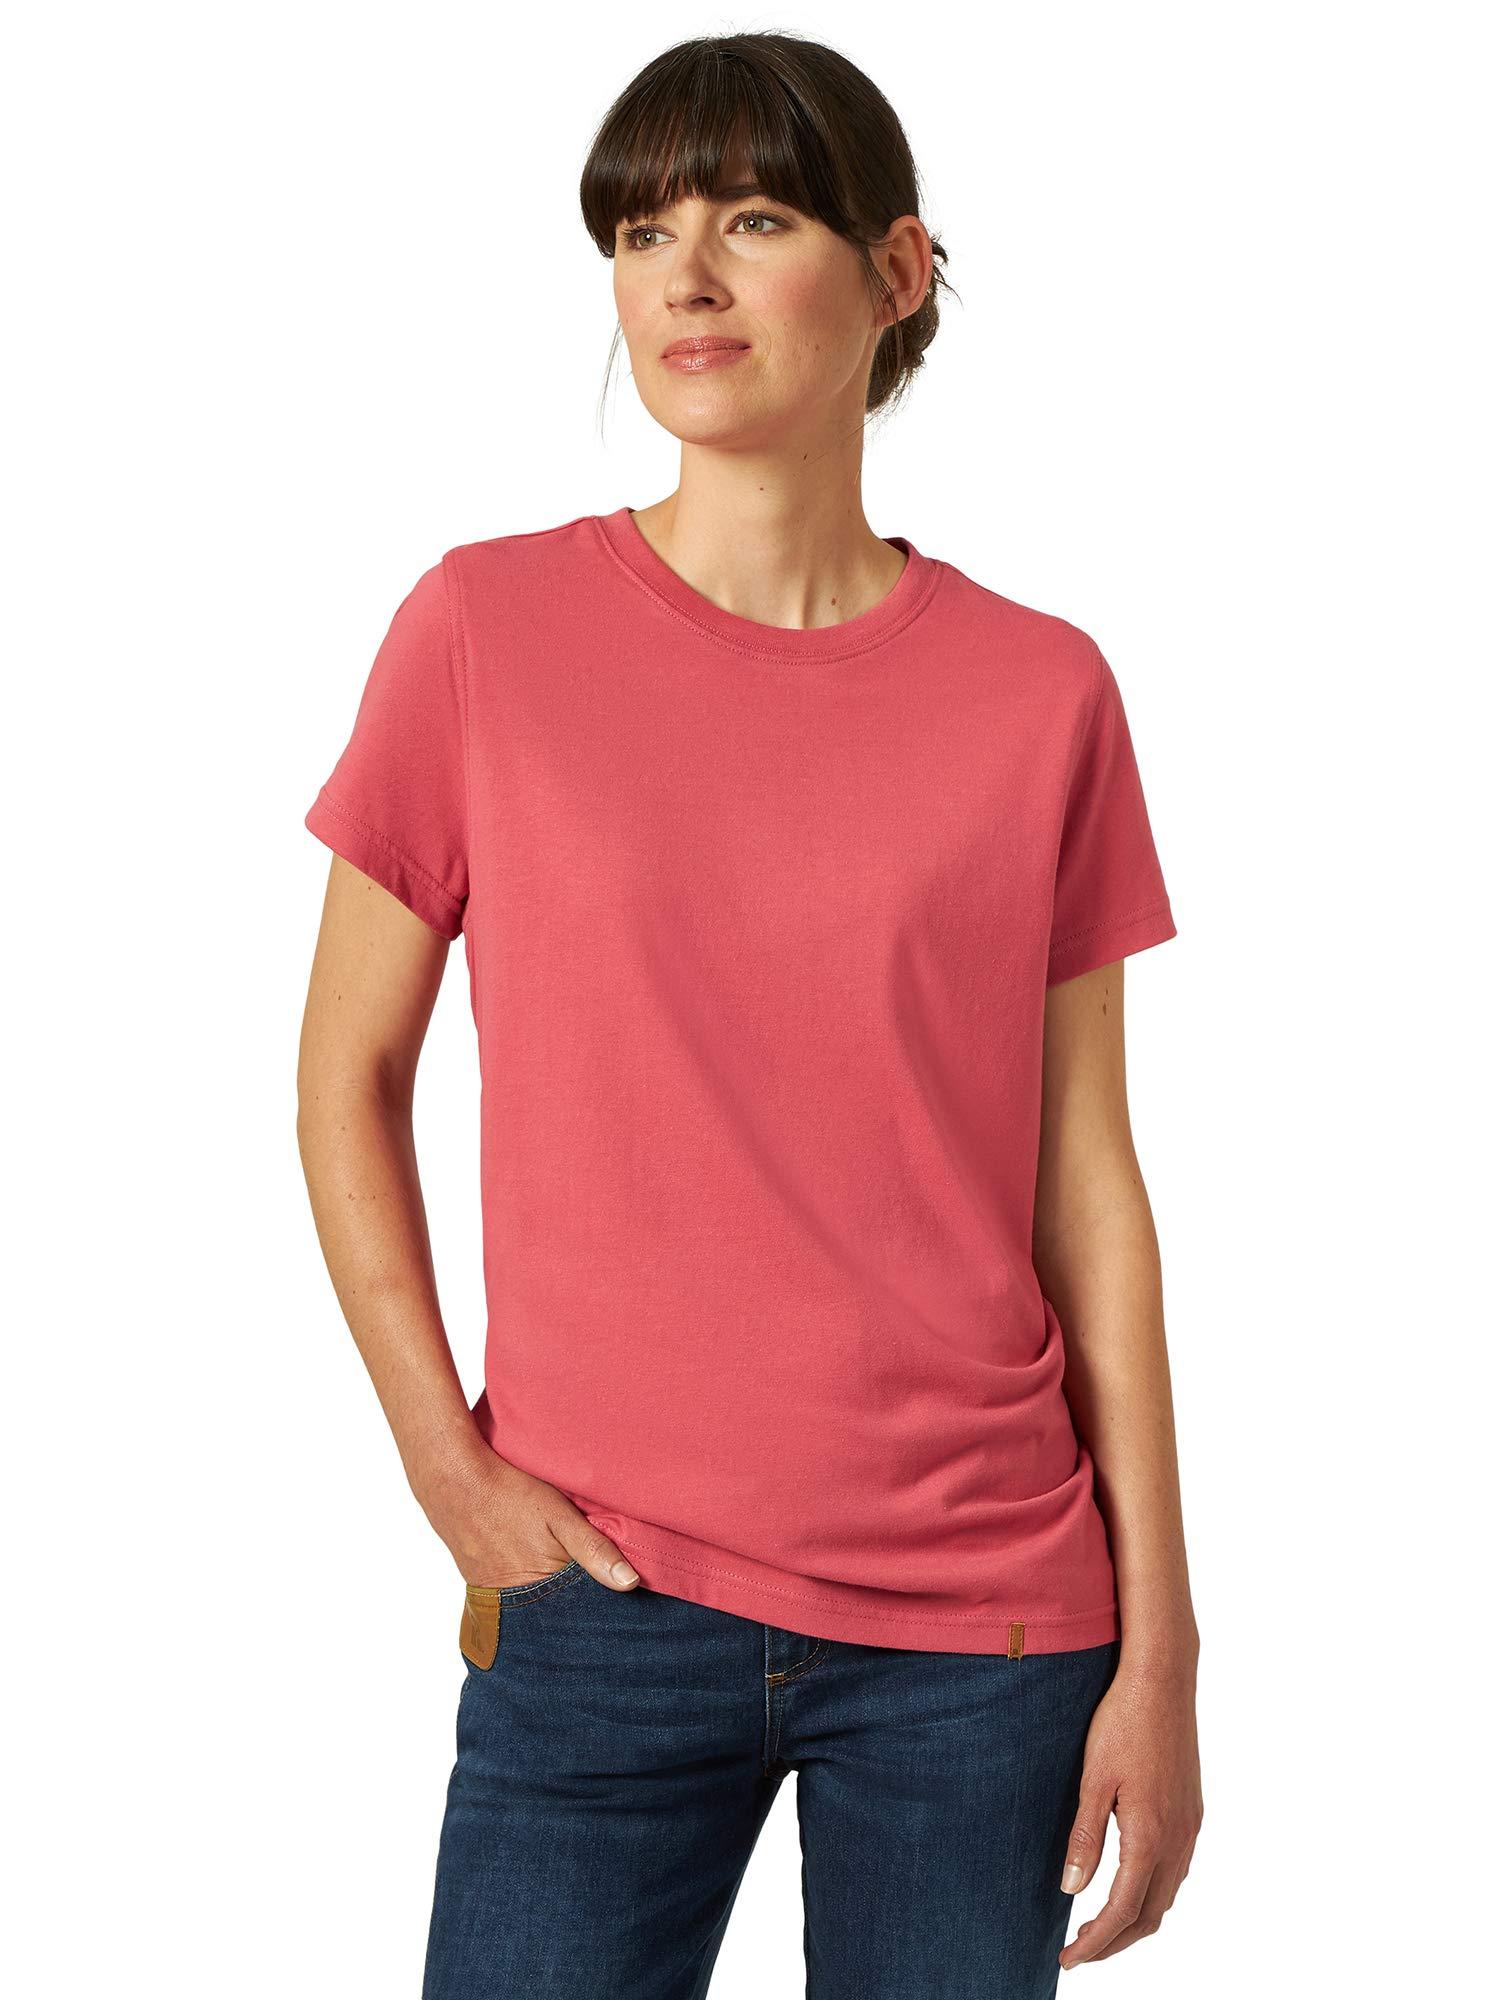 Wrangler Riggs Workwear Women's Short Sleeve Performance T-Shirt